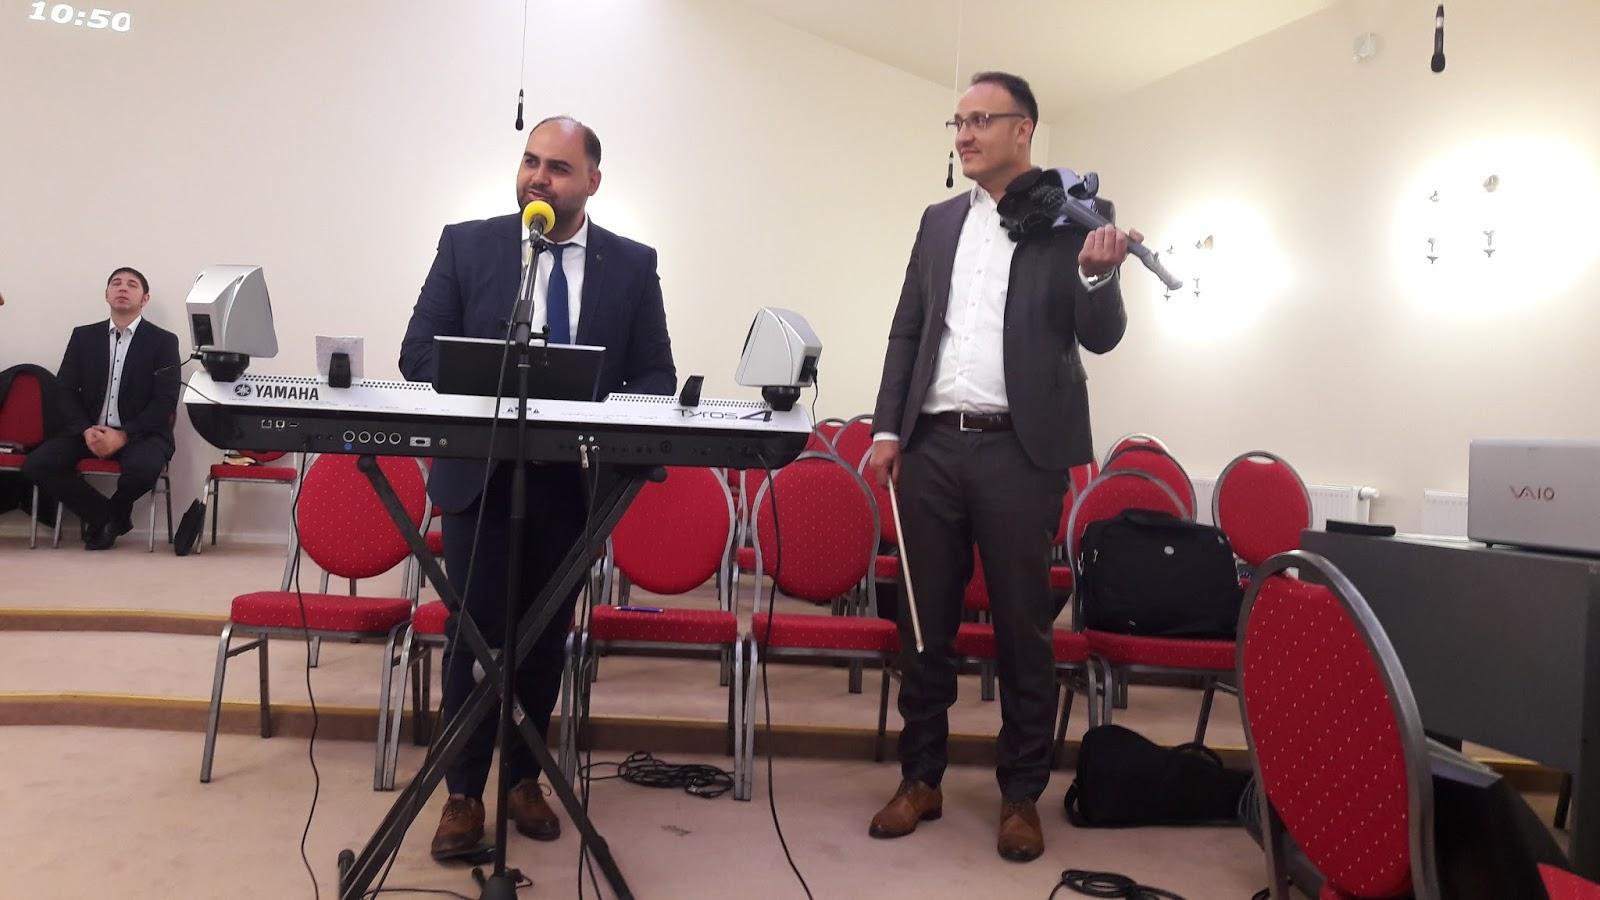 Cristi Ianoș – Acum și noi vom ști